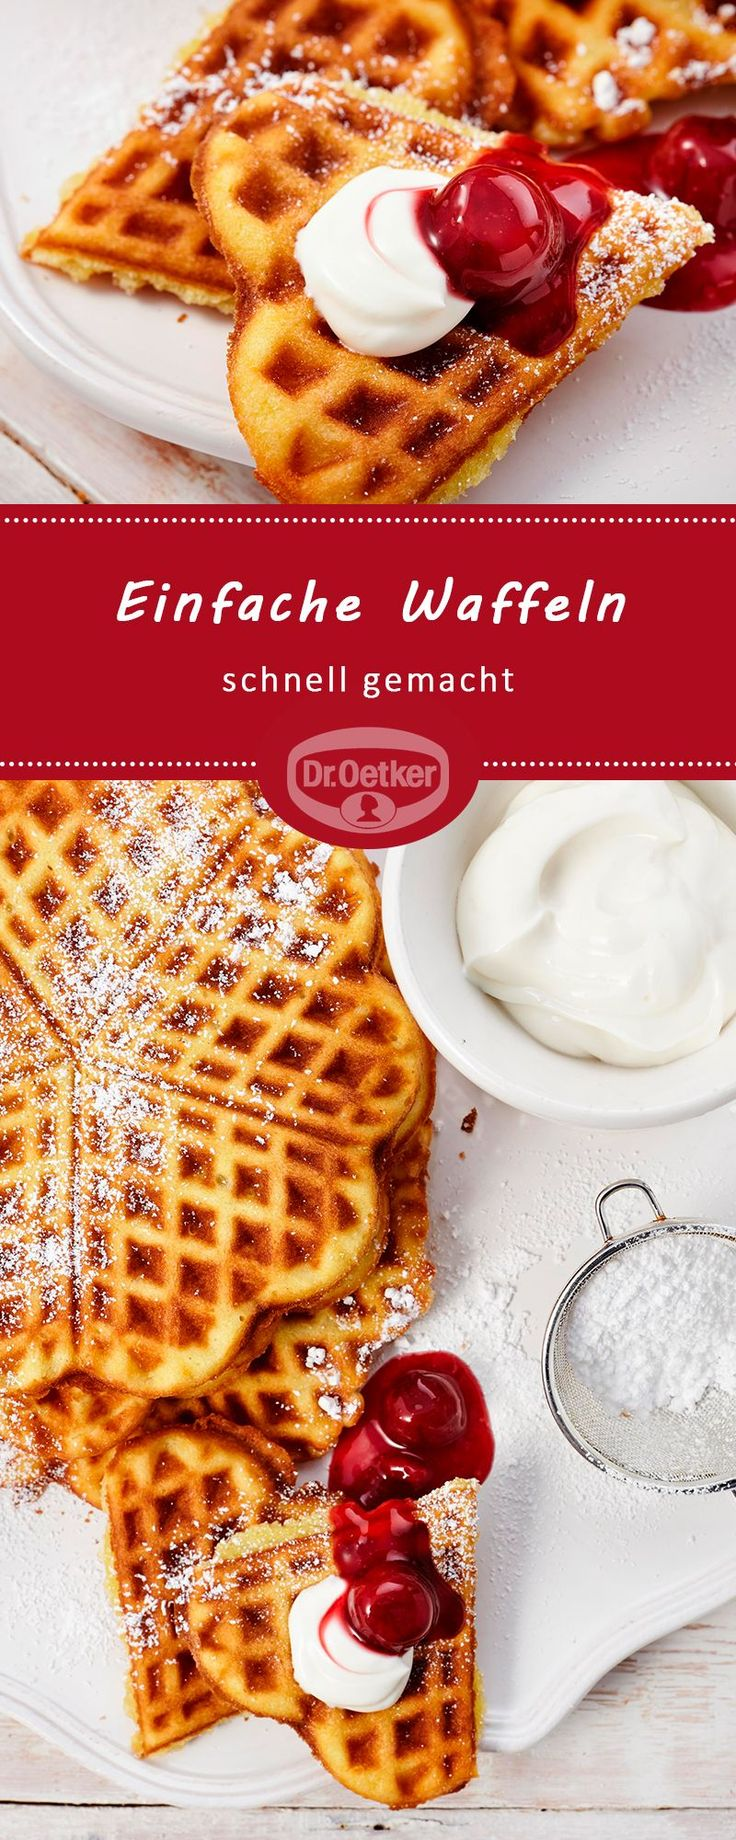 #waffelnbacken #simple #made #waffles #fast    – schnell